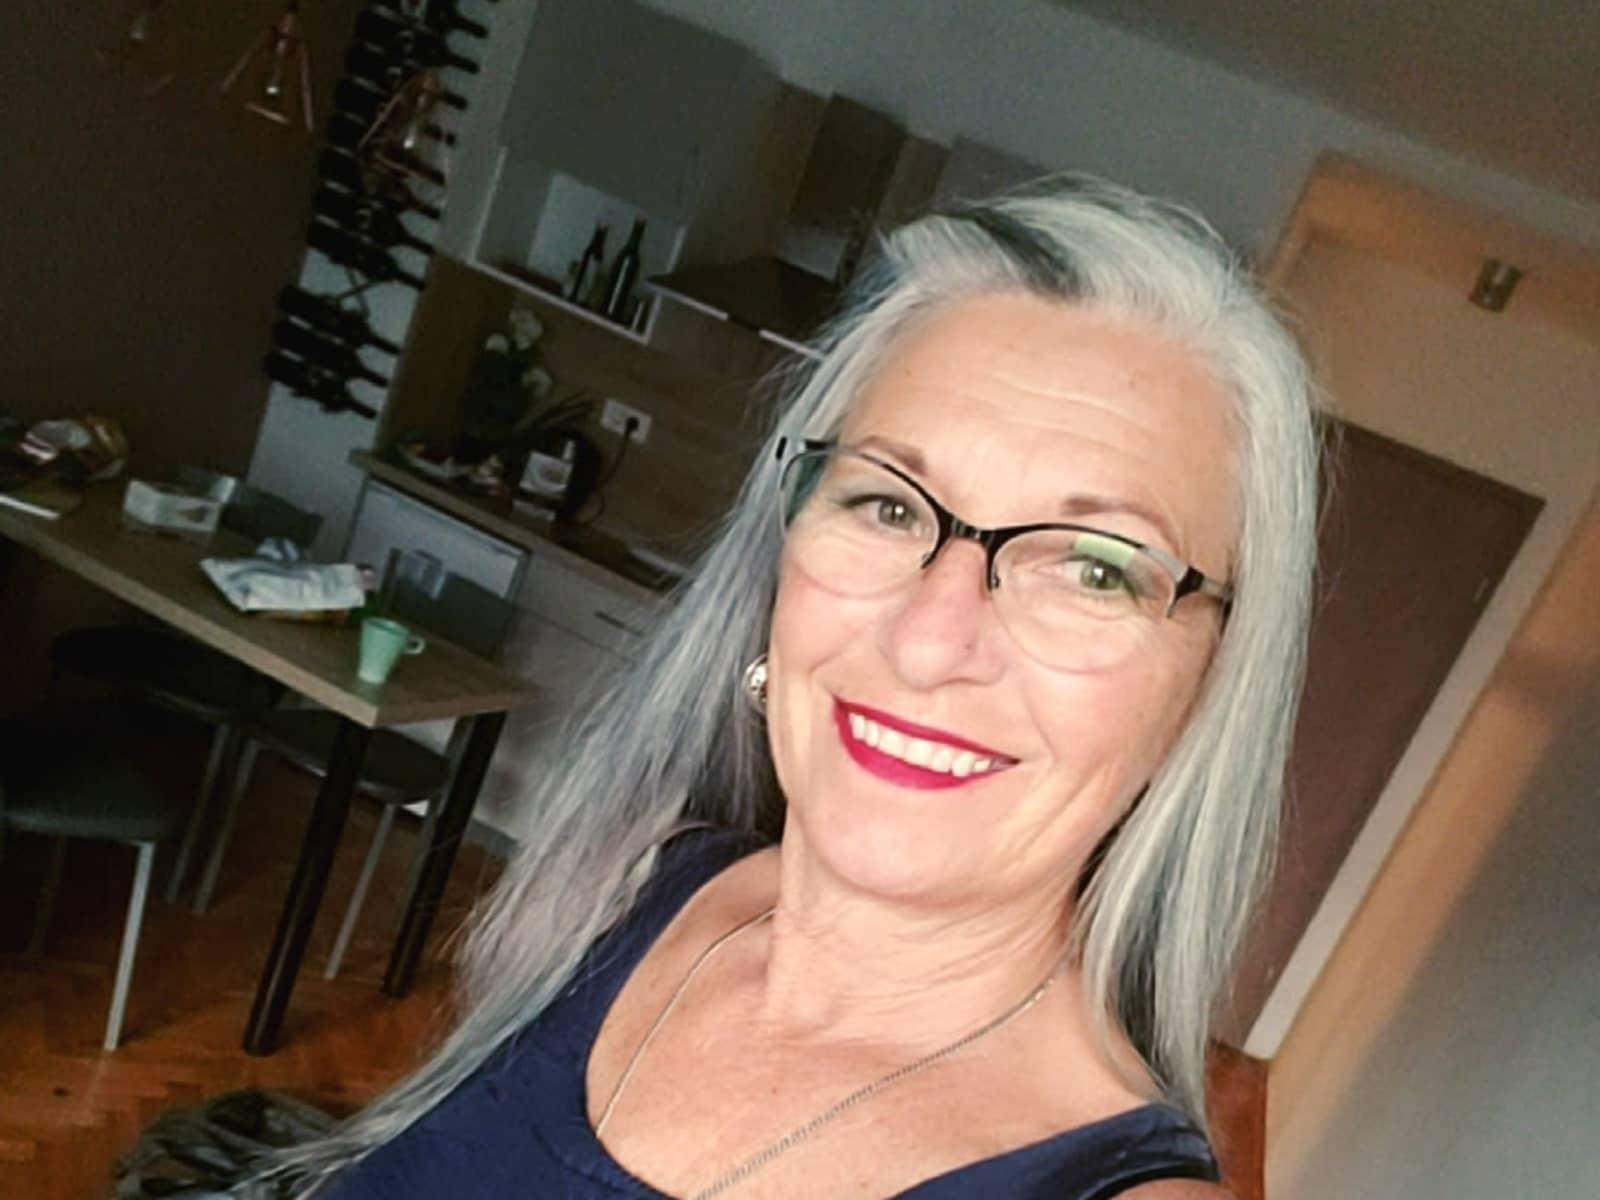 Michele c from Santa Cruz, California, United States